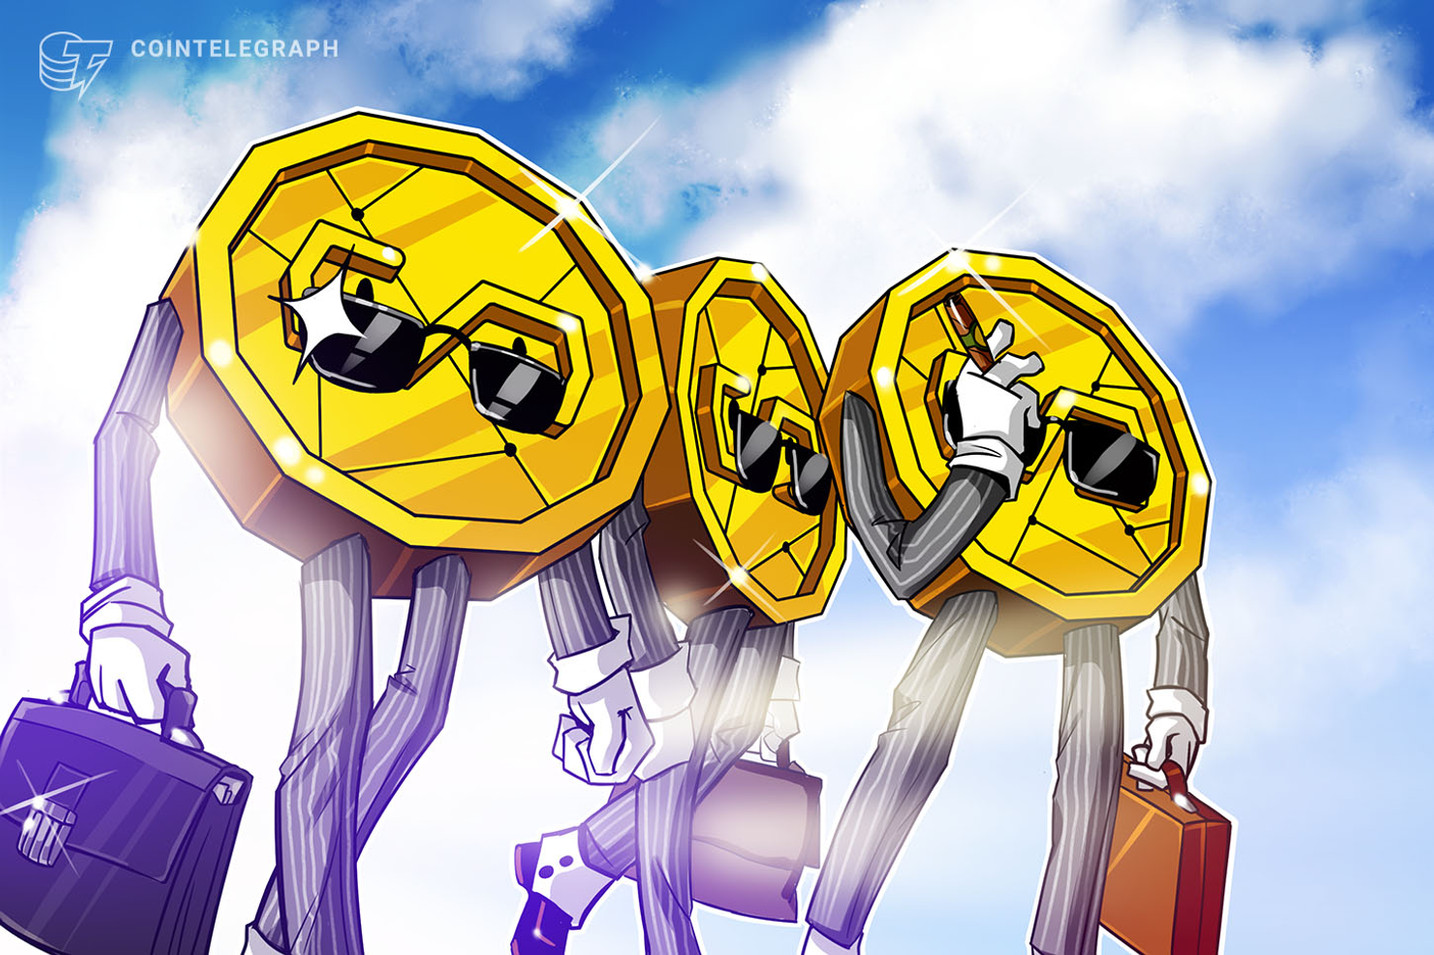 IOSCO、仮想通貨リブラ含むステーブルコインは「既存の規制対象」【ニュース】